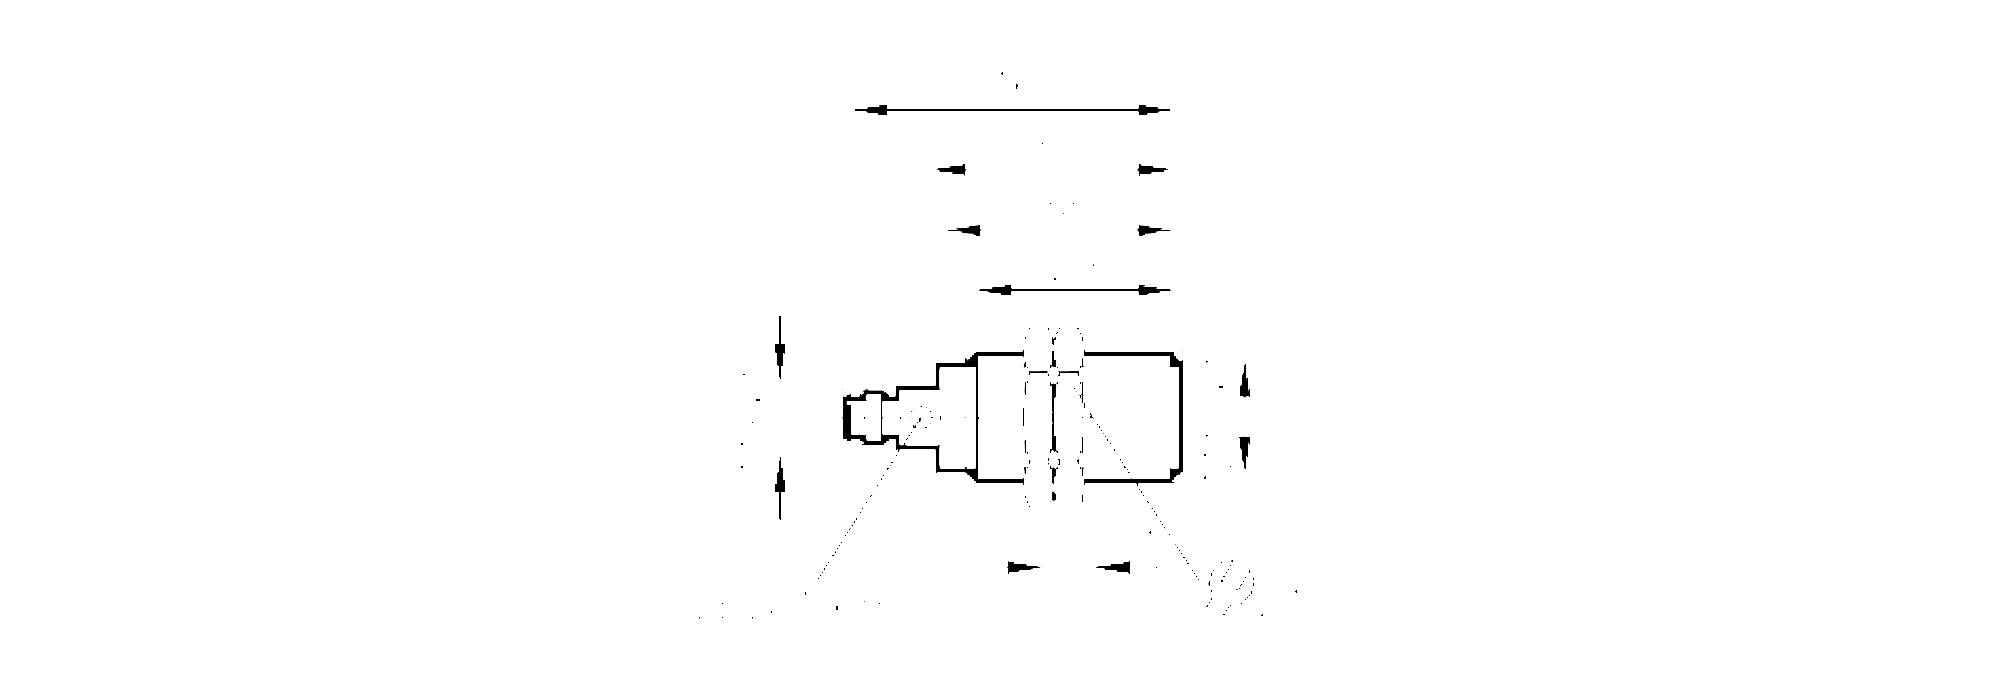 igs210 - inductive sensor